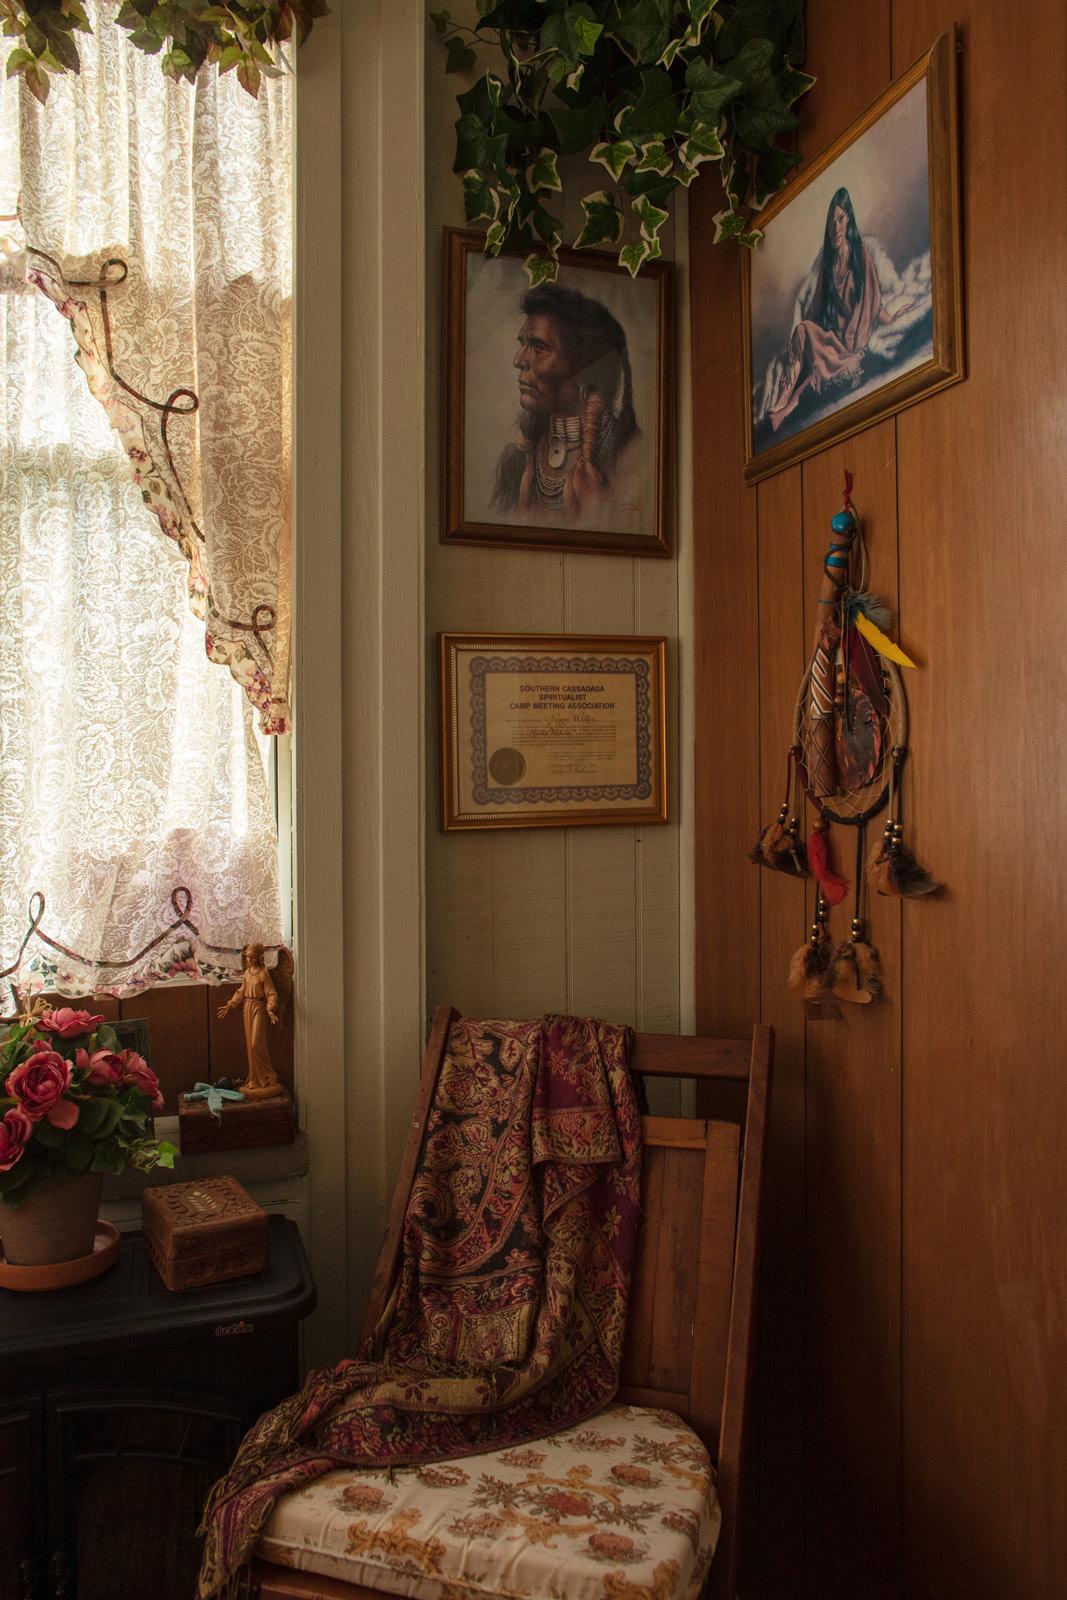 Meet The Spiritual Healers And Mediums Of Cassadaga Florida The Psychic Capitol Of The World